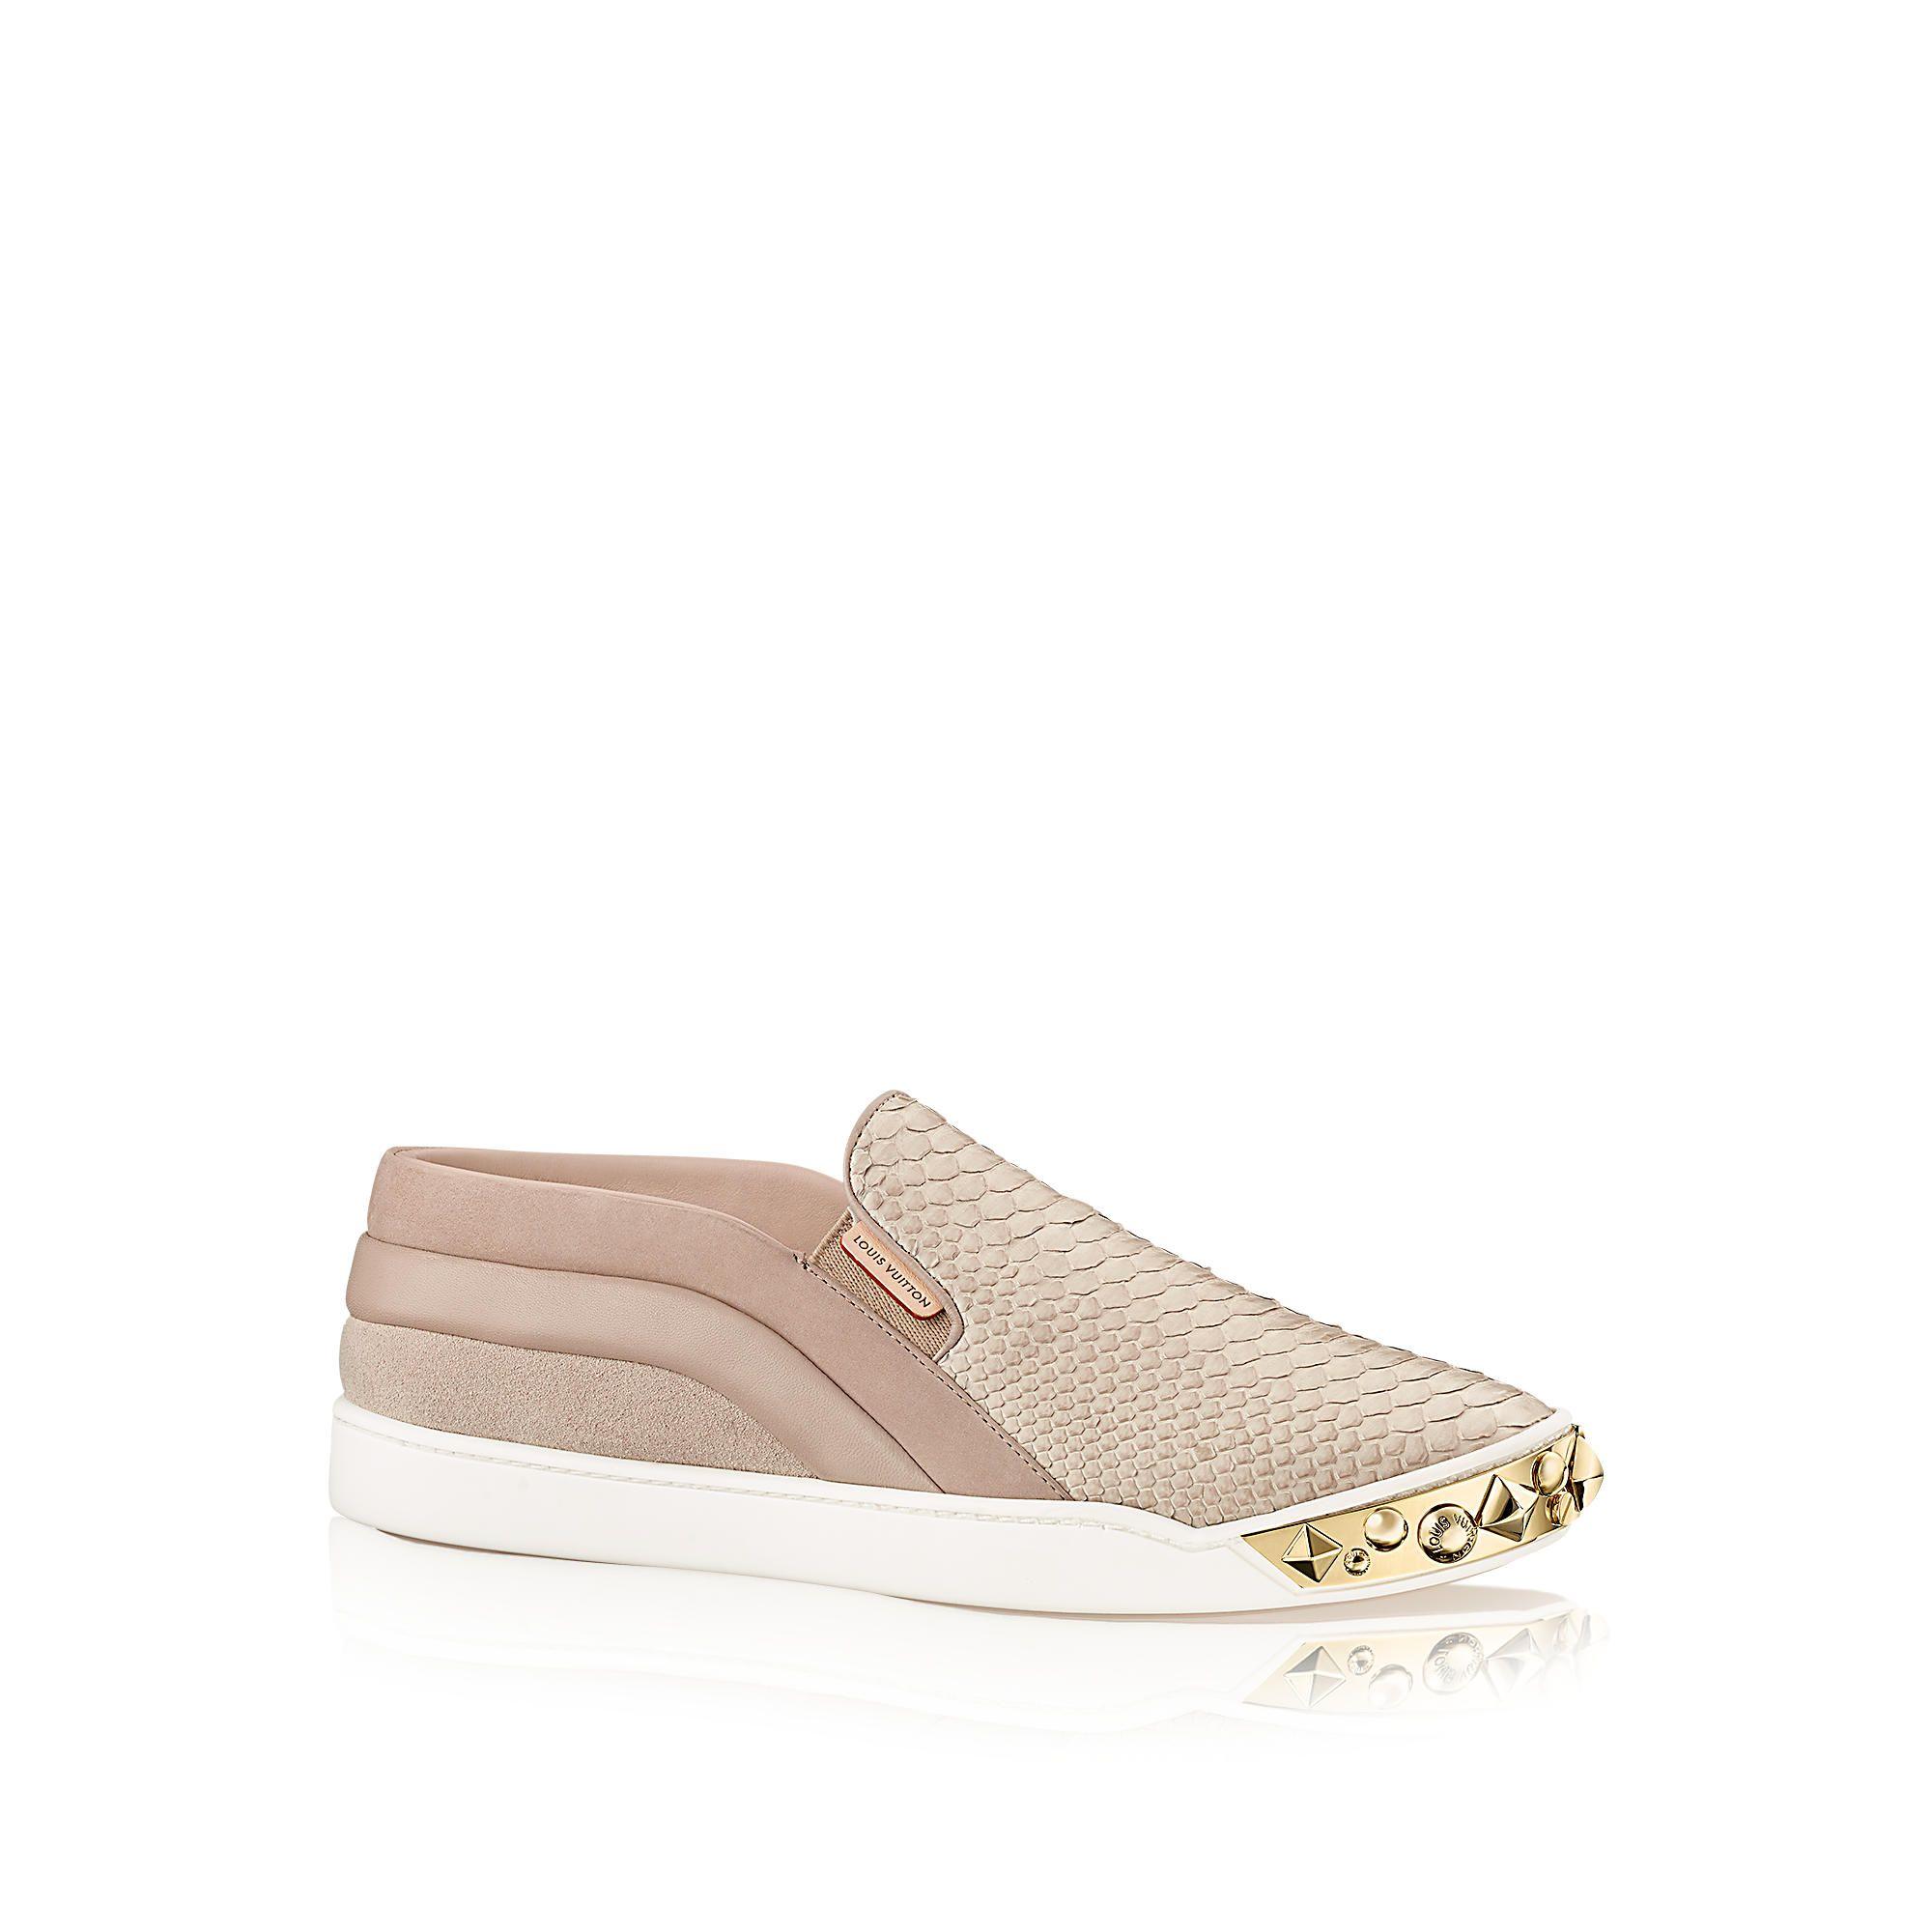 Louis vuitton sneakers de